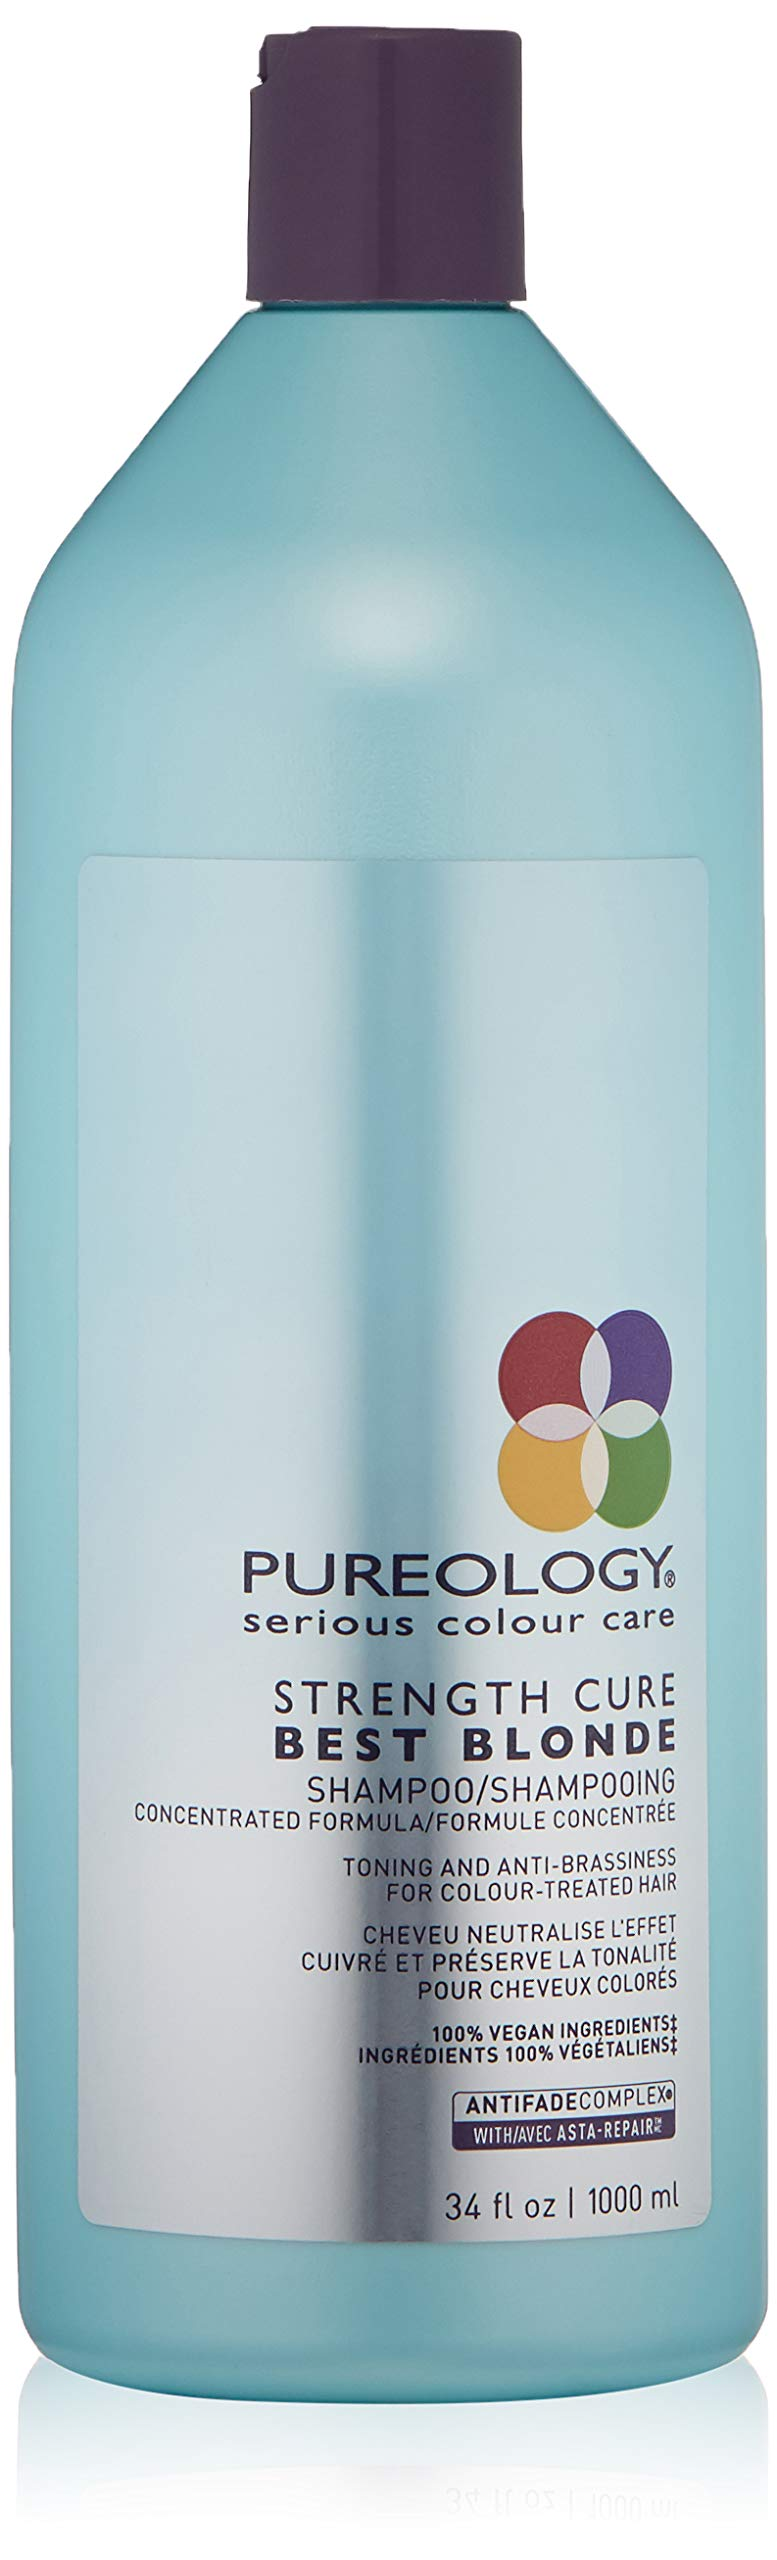 Pureology Strength Cure Best Blonde Purple Shampoo, 33.8 Fl Oz